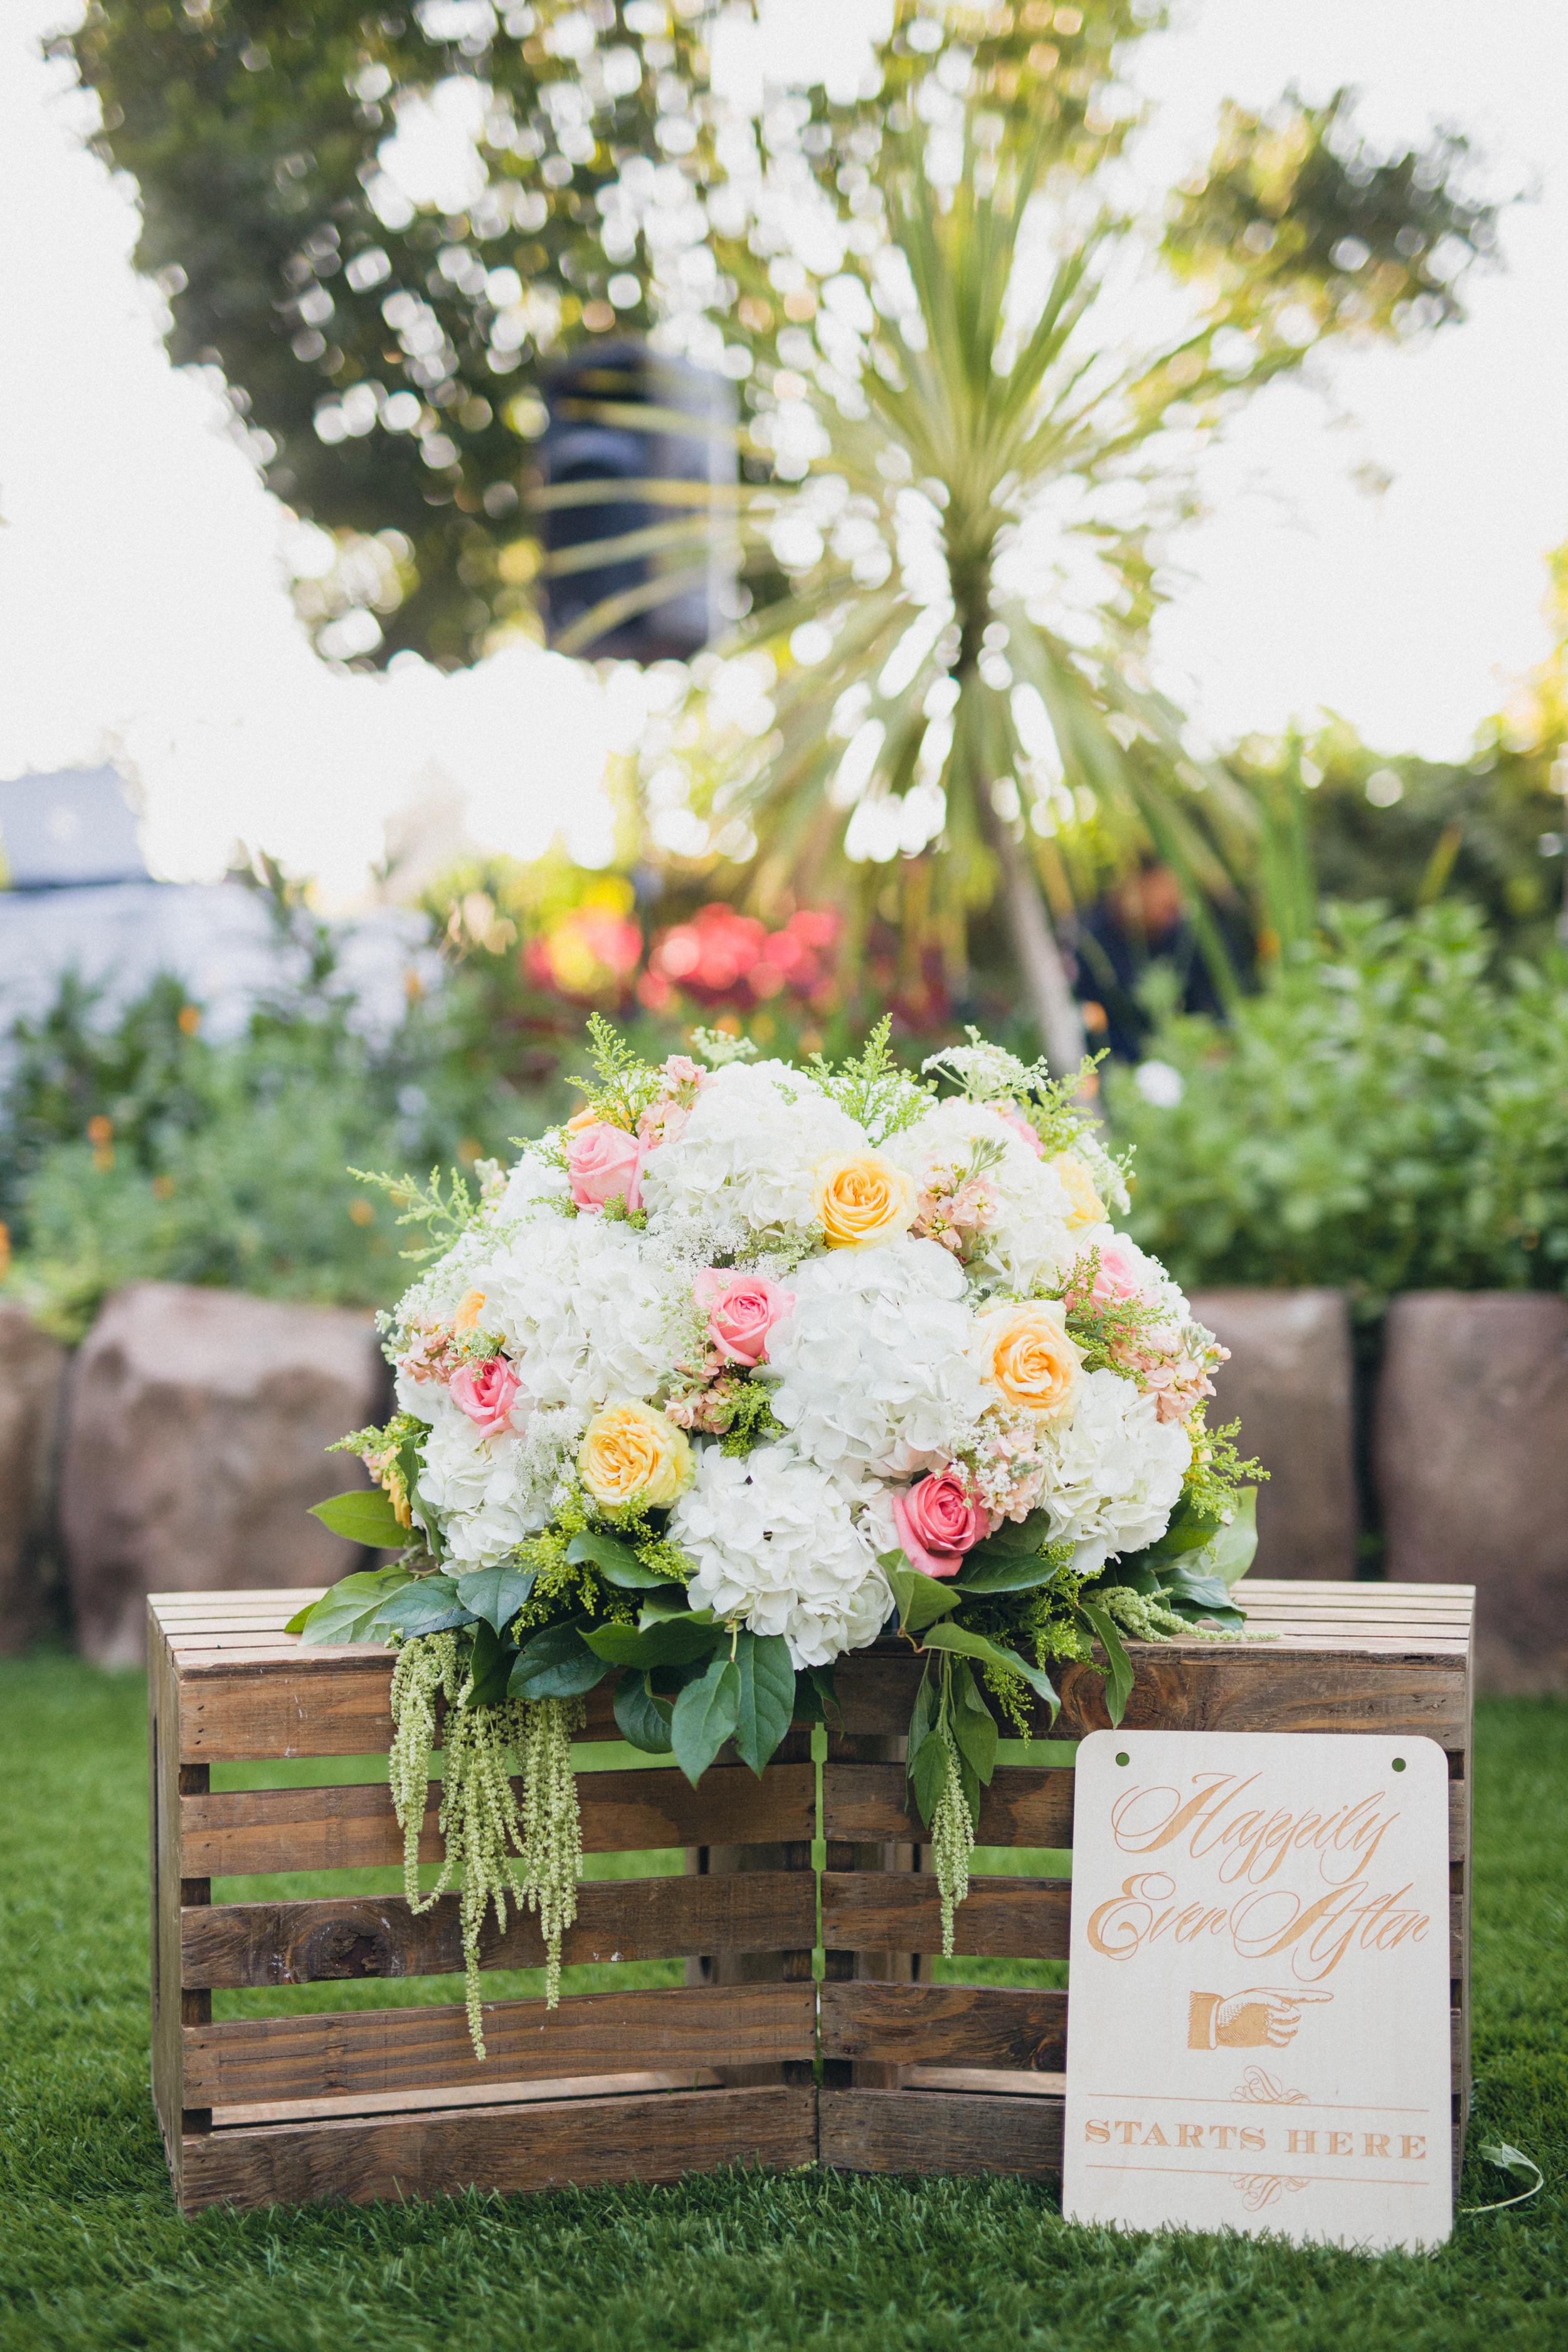 062 Hartley Botanica Wedding Photography Cotton Love Studios.jpg